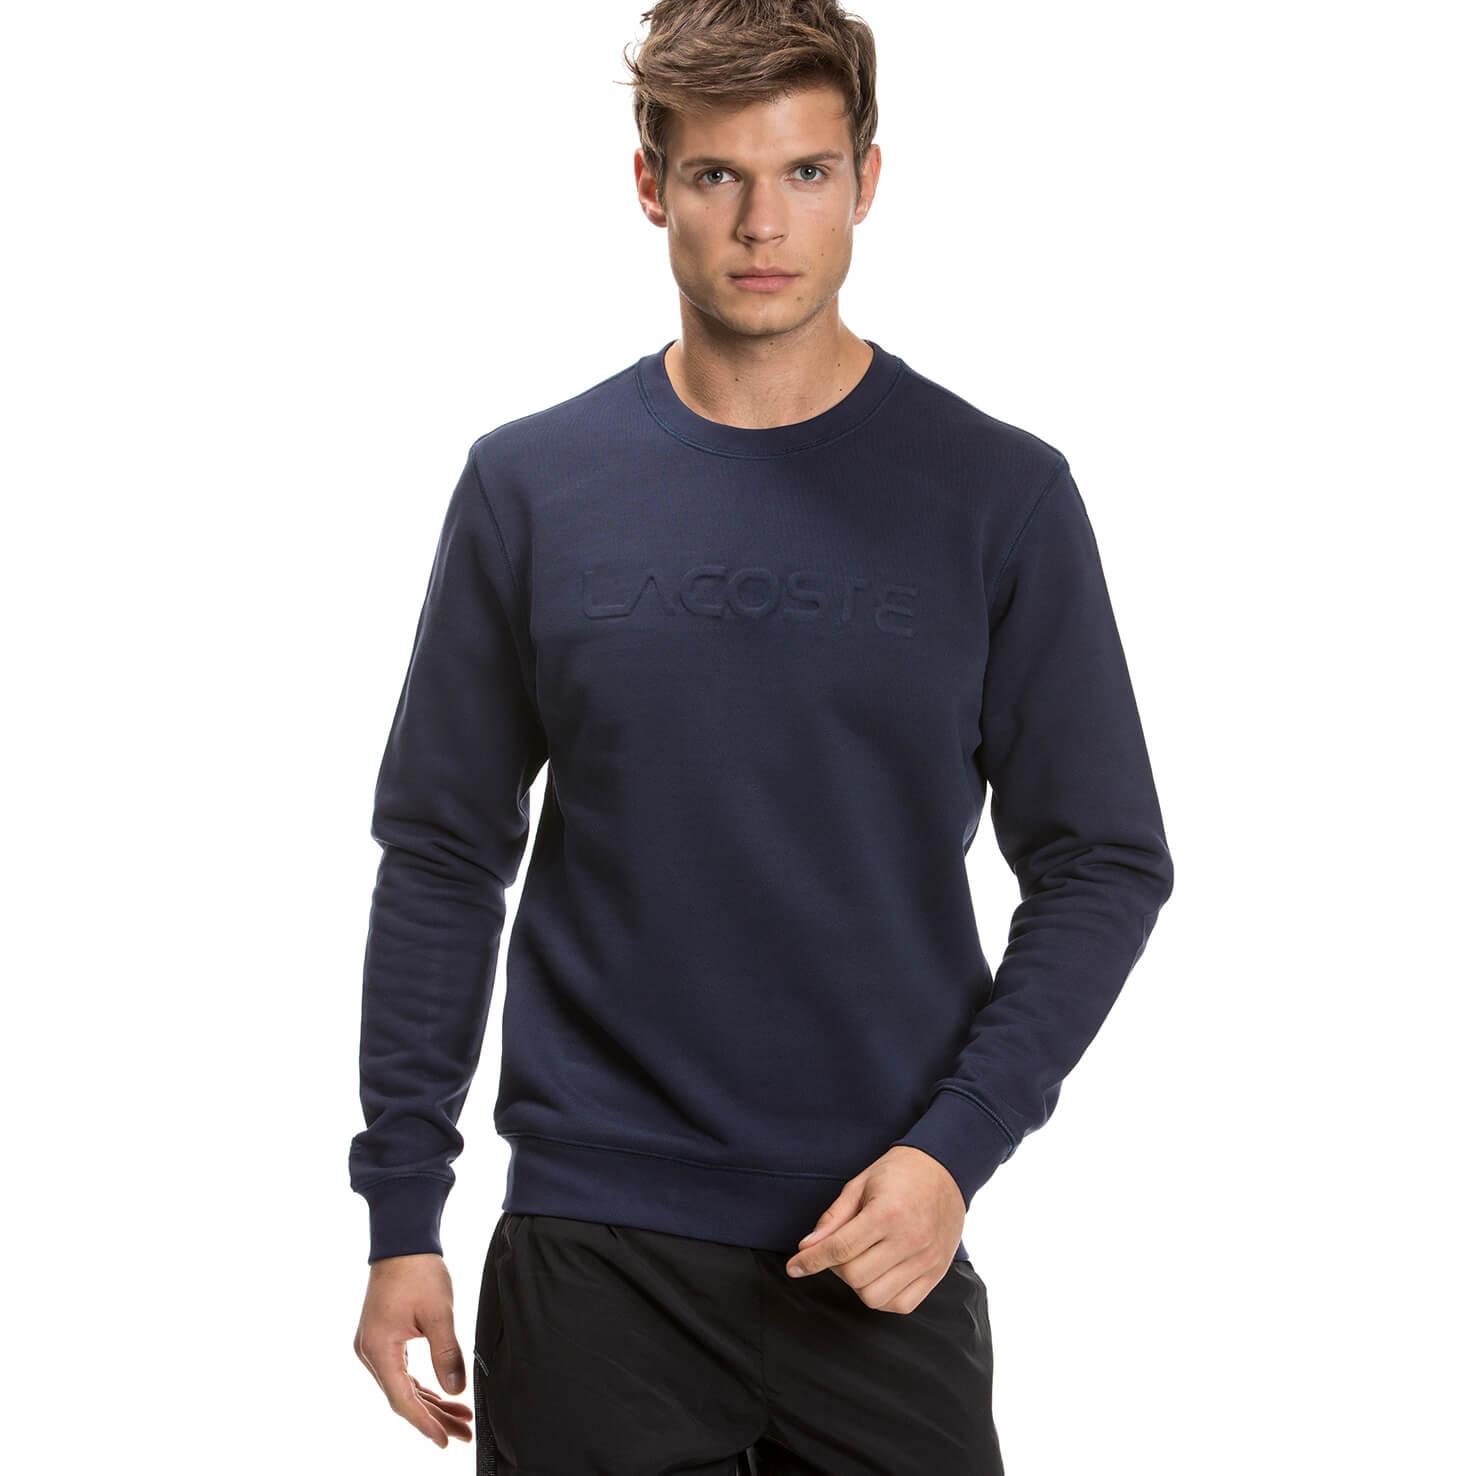 Lacoste Erkek Lacivert Sweatshirt